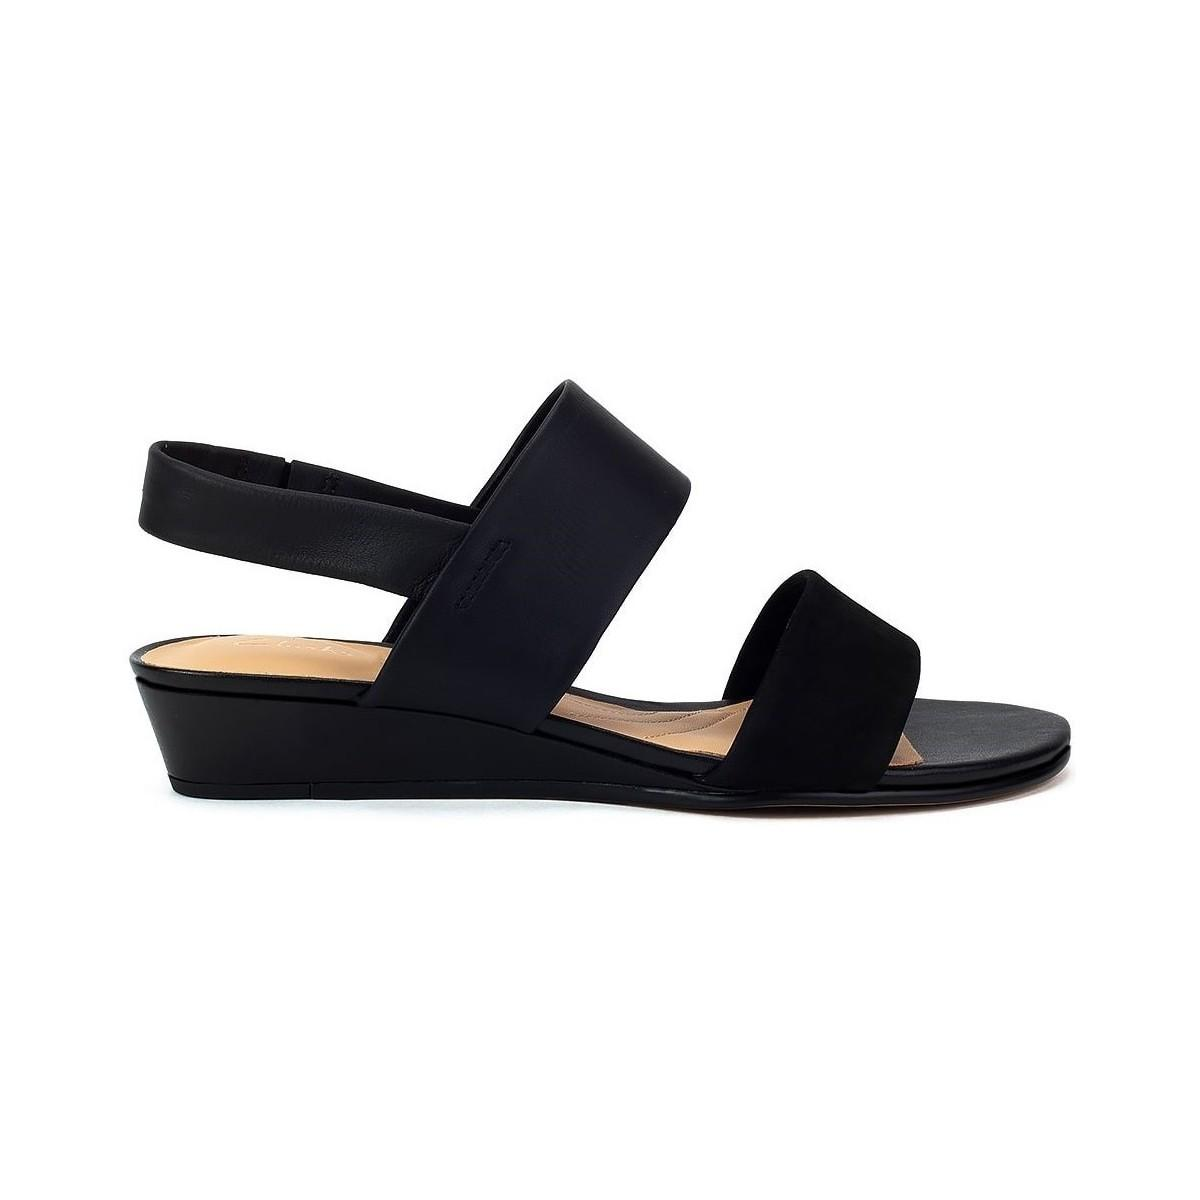 28cbd39f1c09 Clarks Sense Lily Women s Sandals In Black in Black - Lyst